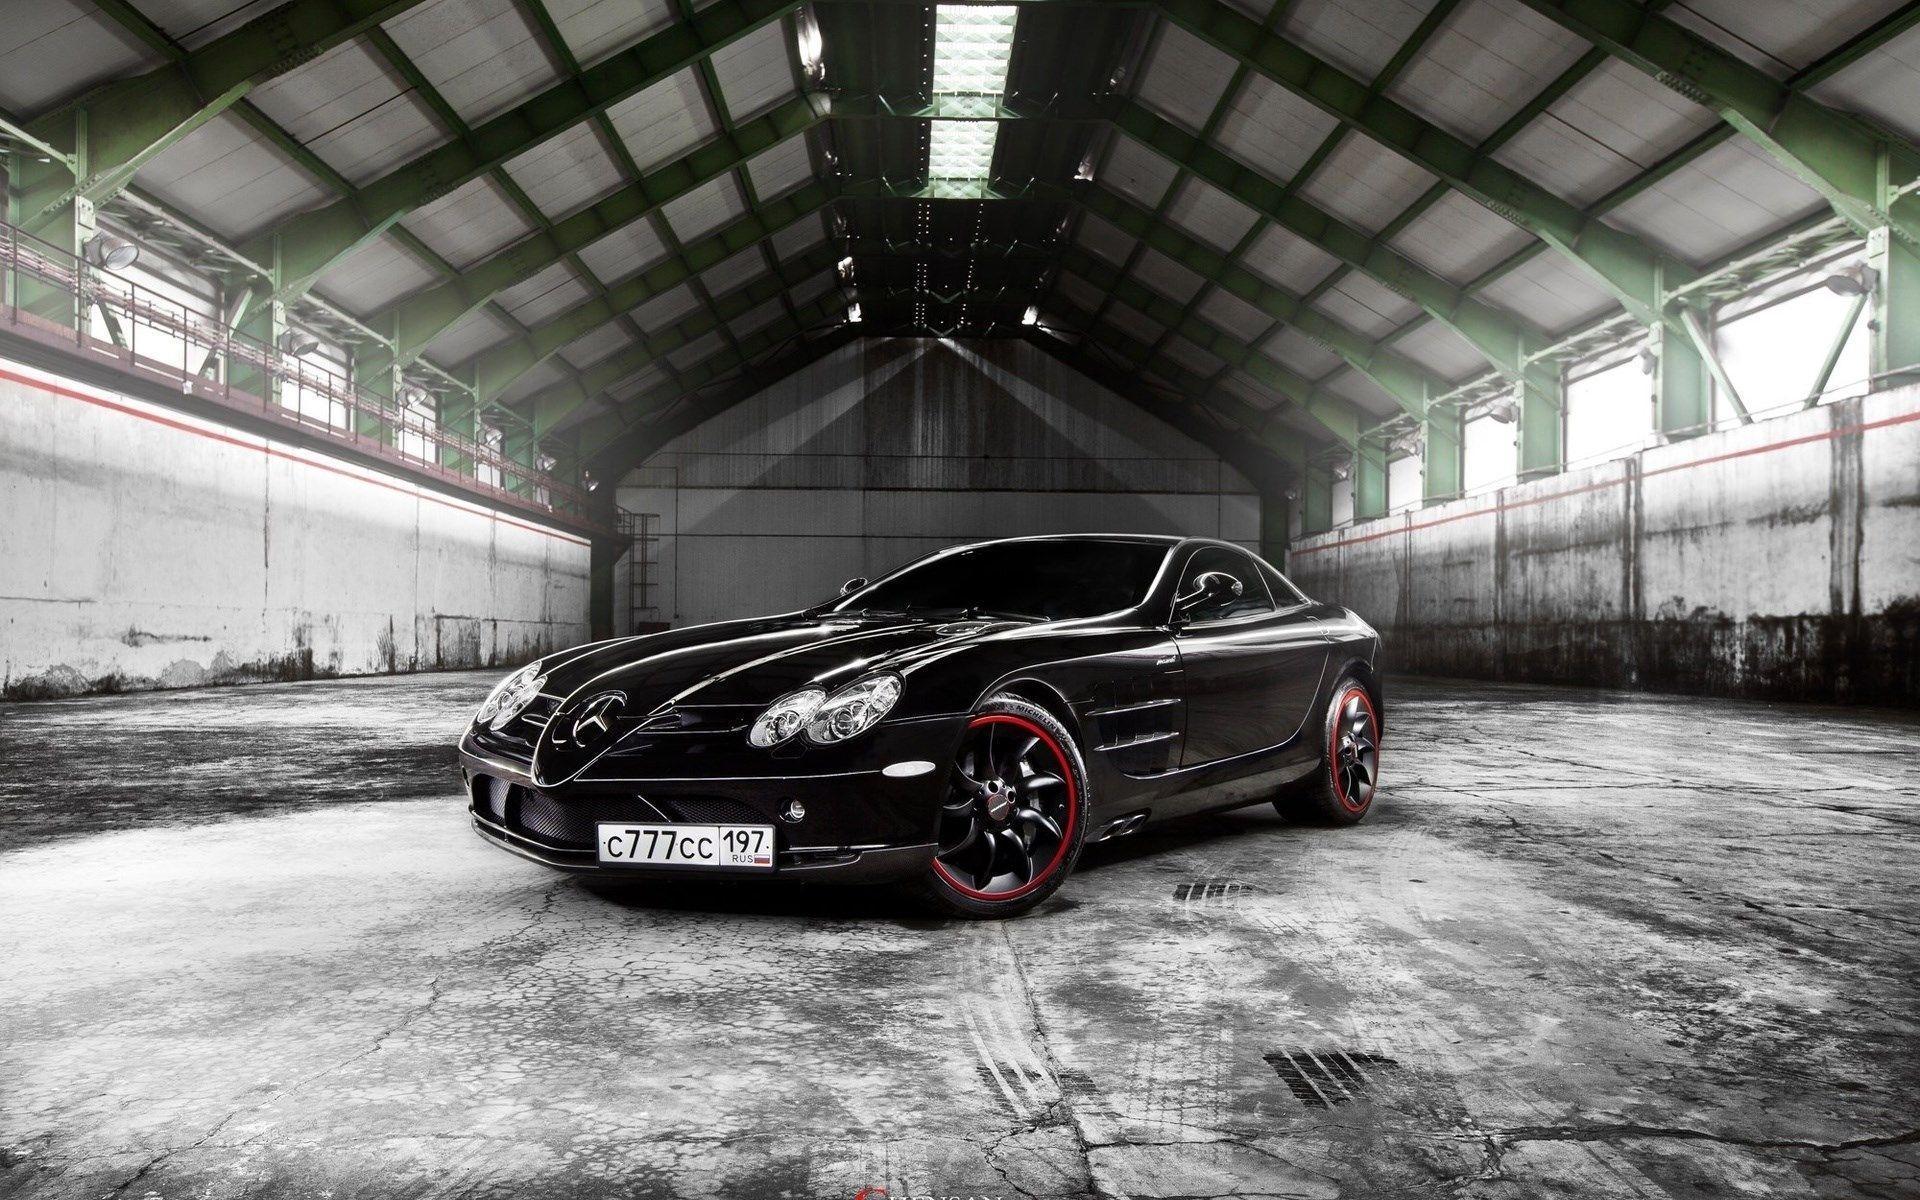 mercedes benz slr mclaren rims red line hd wallpaper zoomwalls - Mercedes Benz Slr Wallpaper Hd